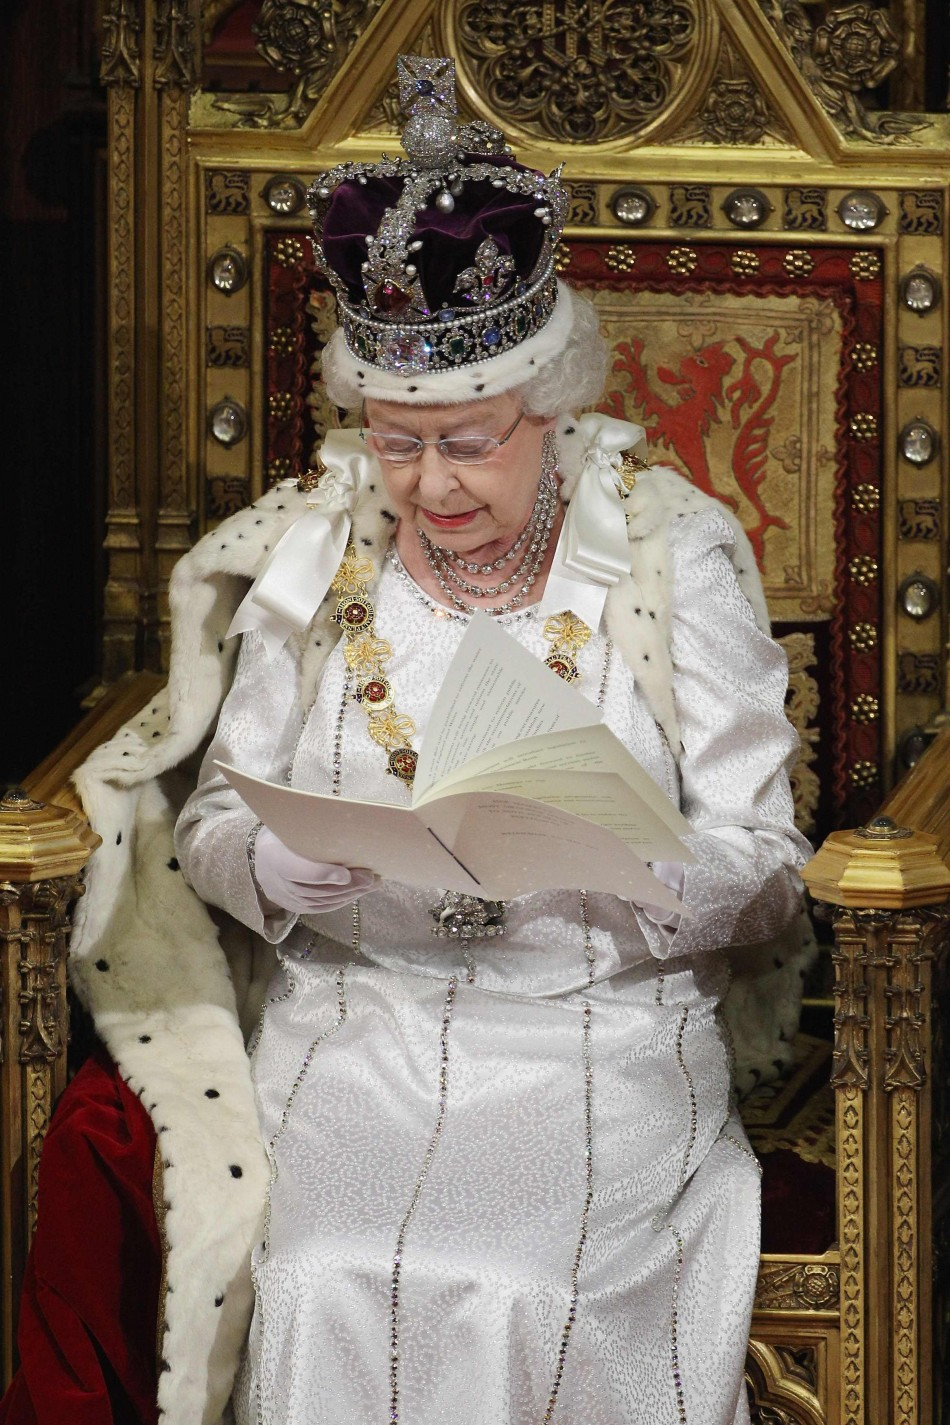 De Beers, Valentino and Other Designers Celebrate Queen's Diamond Jubilee at Harrods